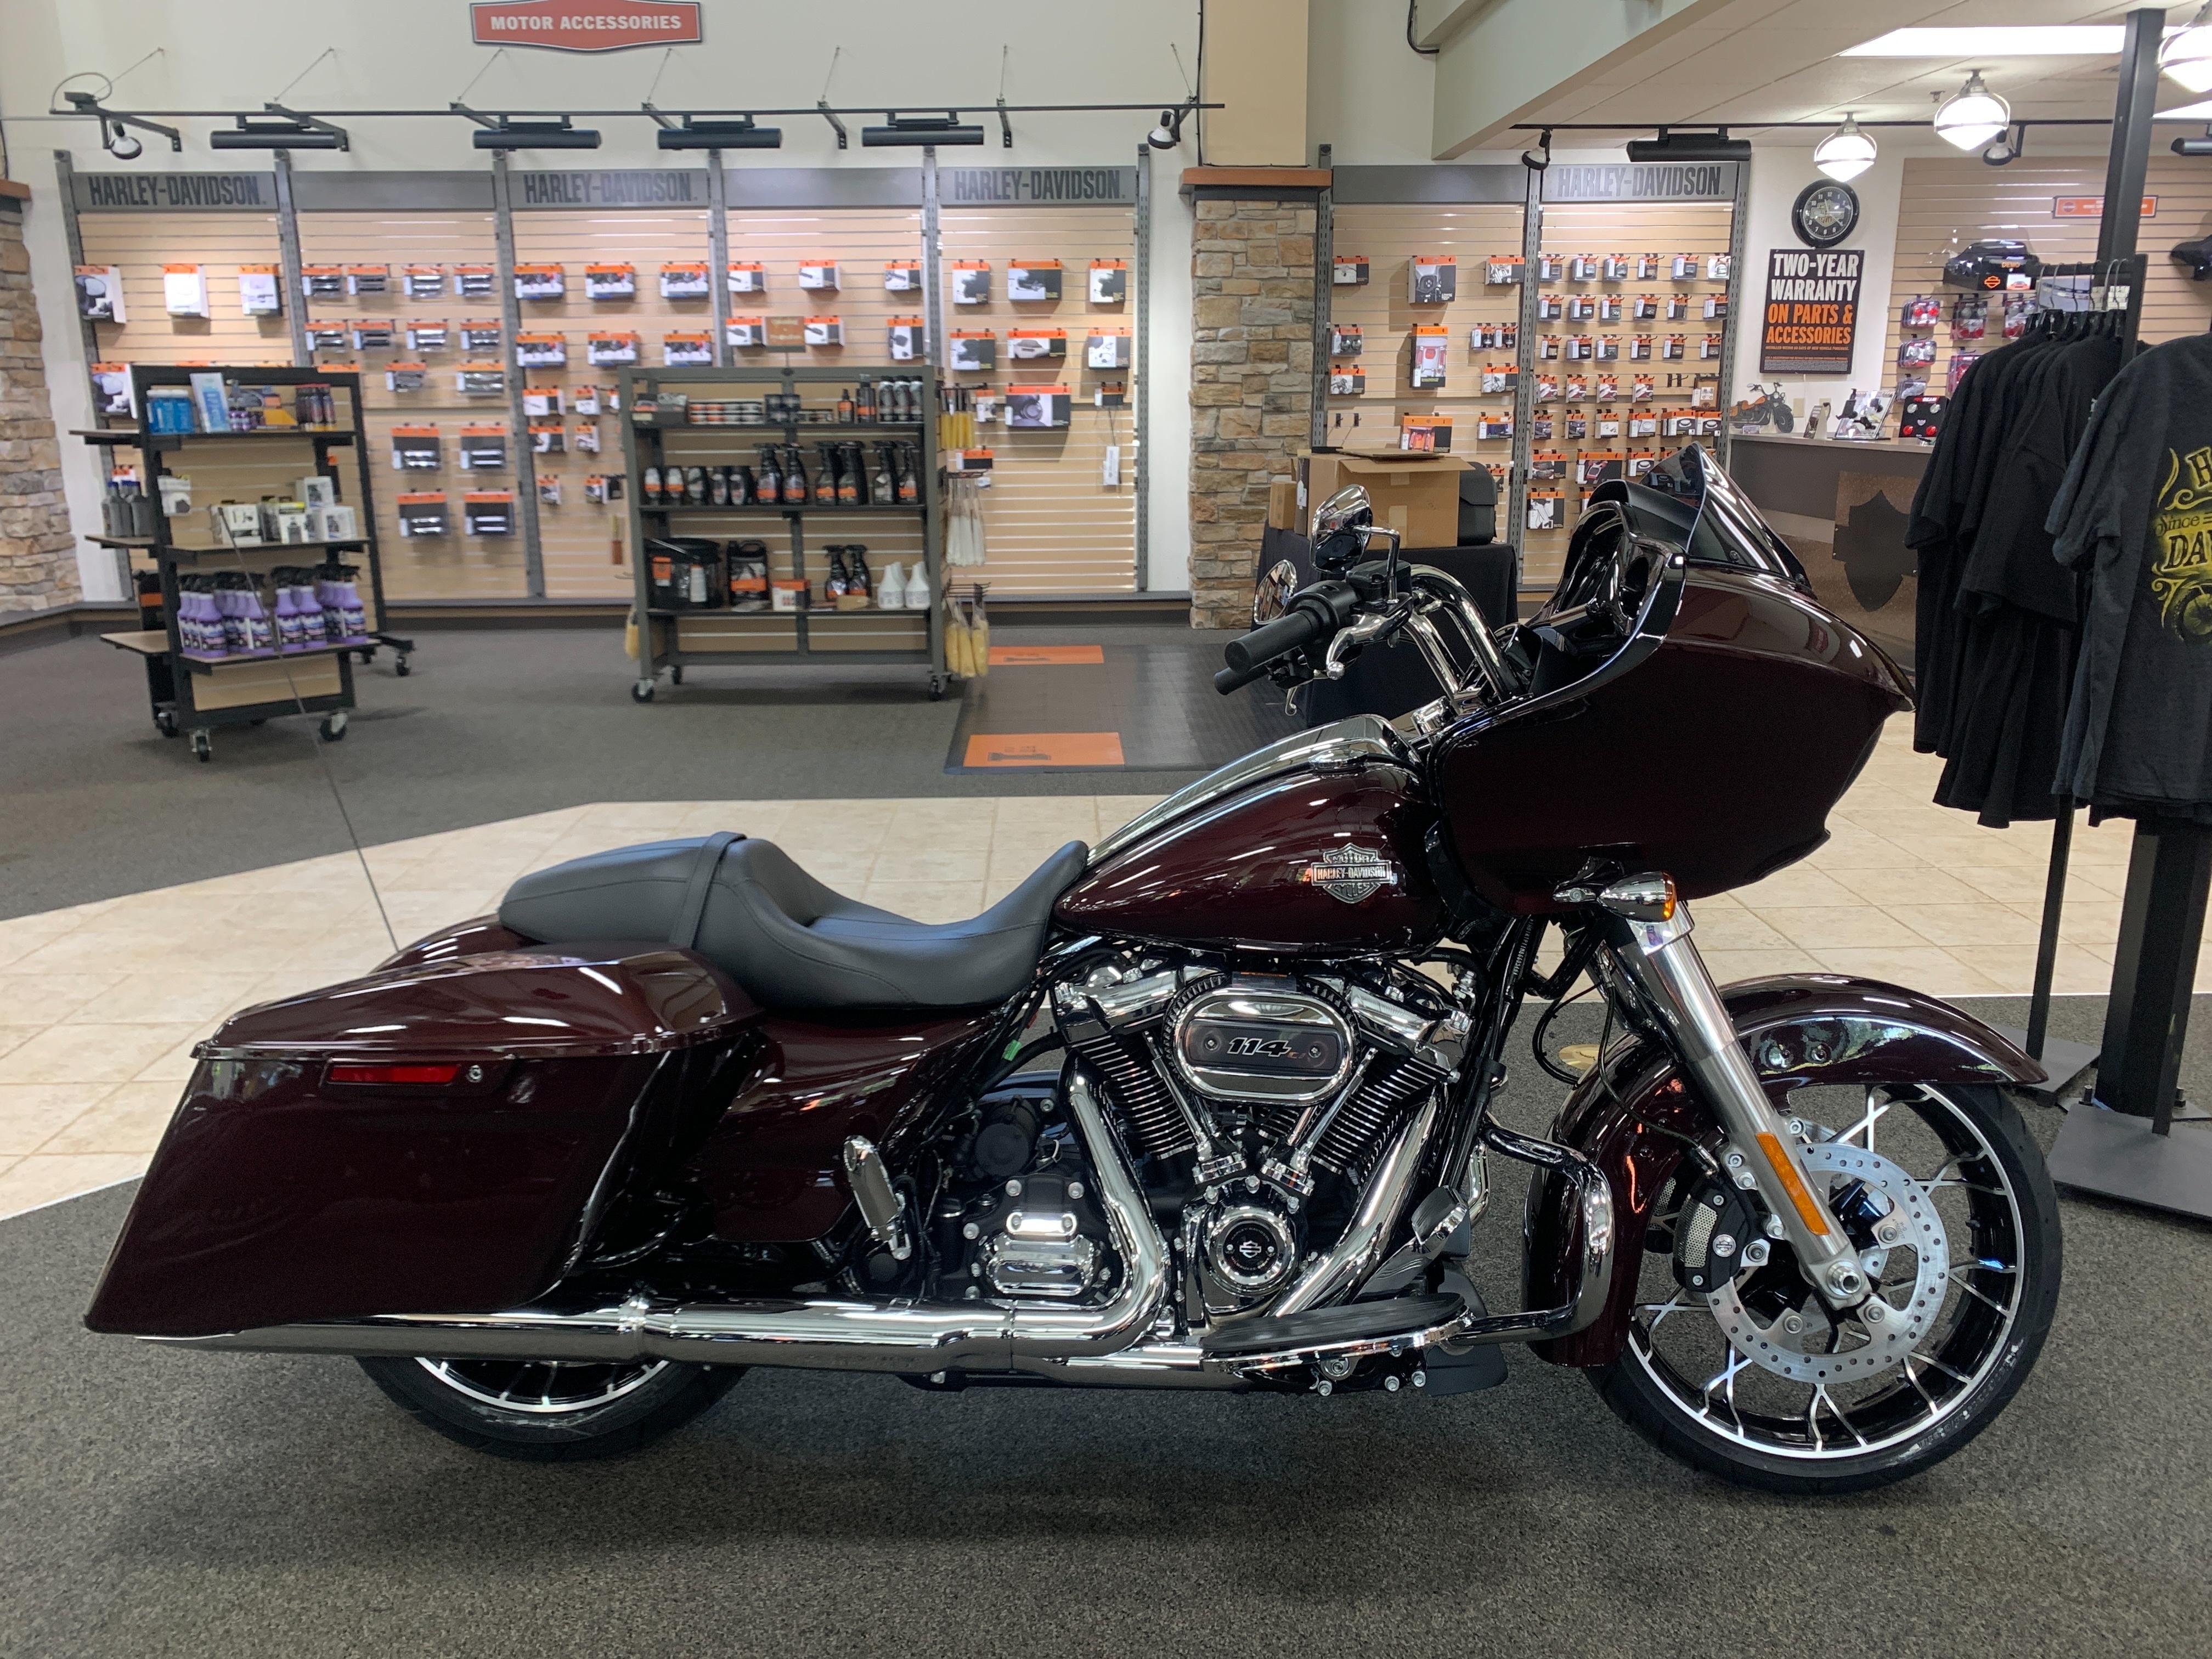 2021 Harley-Davidson Grand American Touring Road Glide Special at Destination Harley-Davidson®, Silverdale, WA 98383